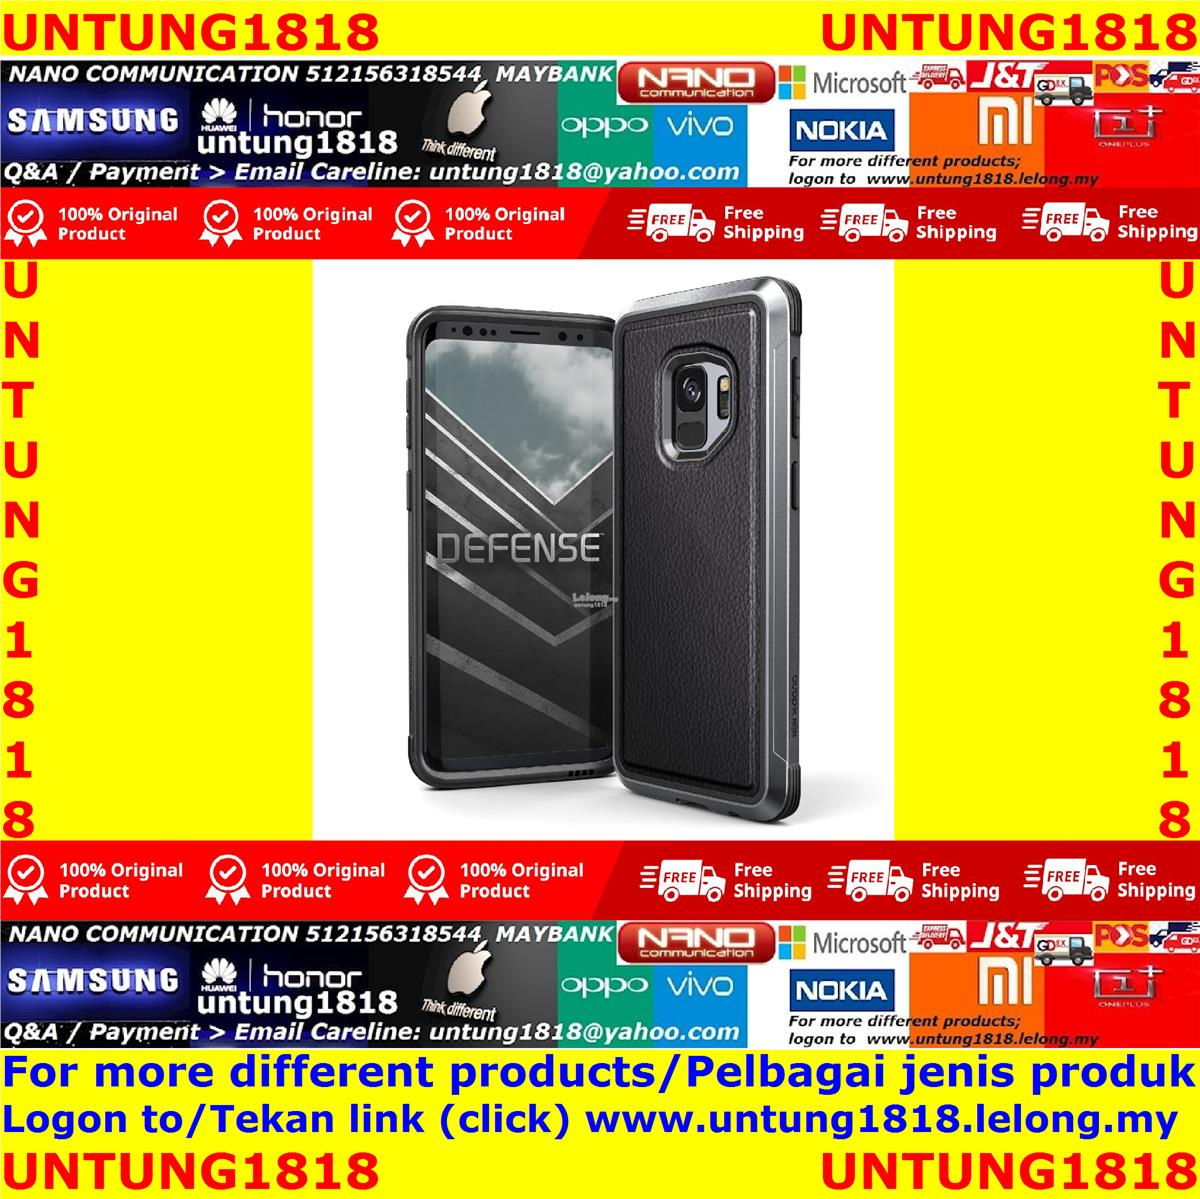 Samsung Galaxy S9 More Accessories Choice*